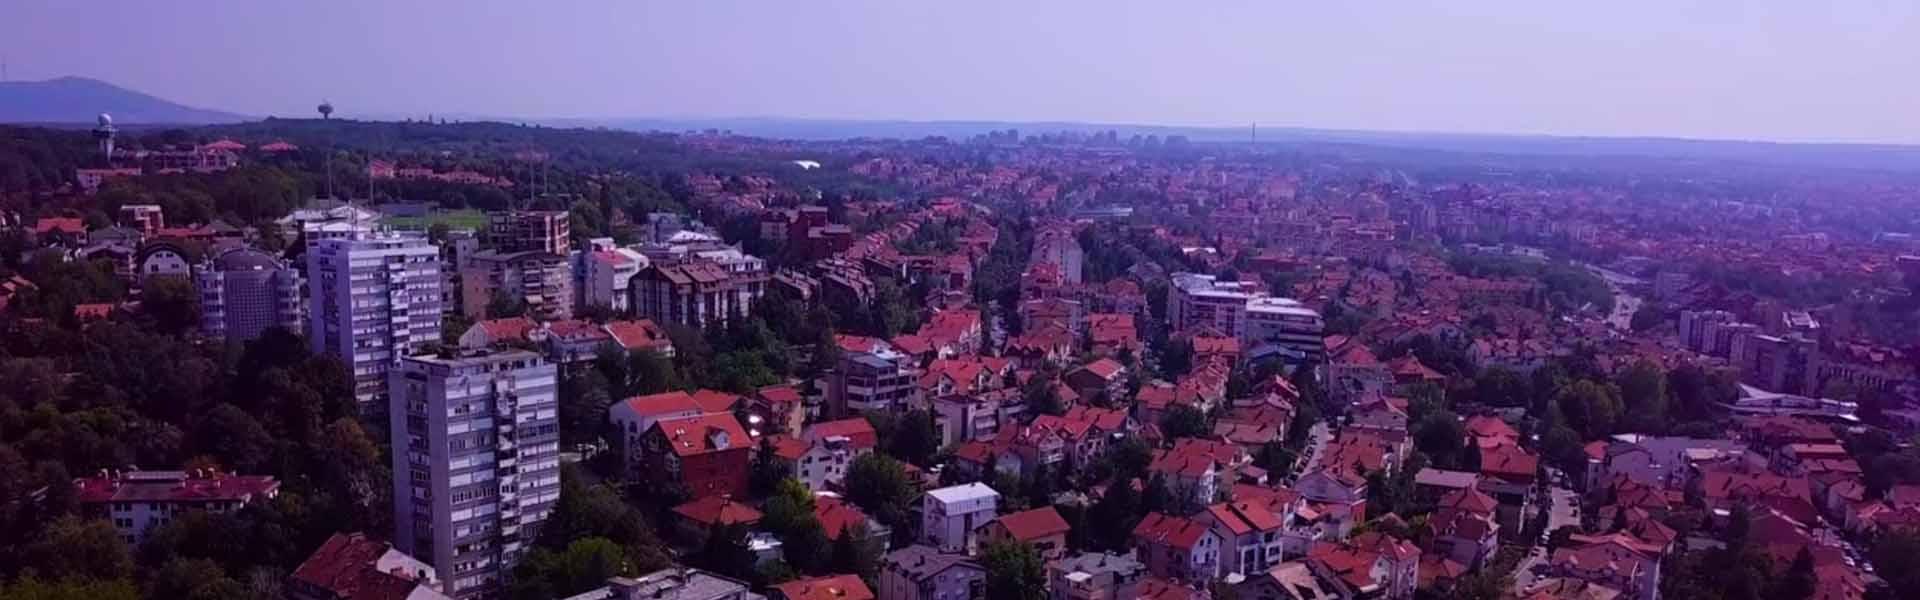 Dostava hrane Banovo brdo   Beograd